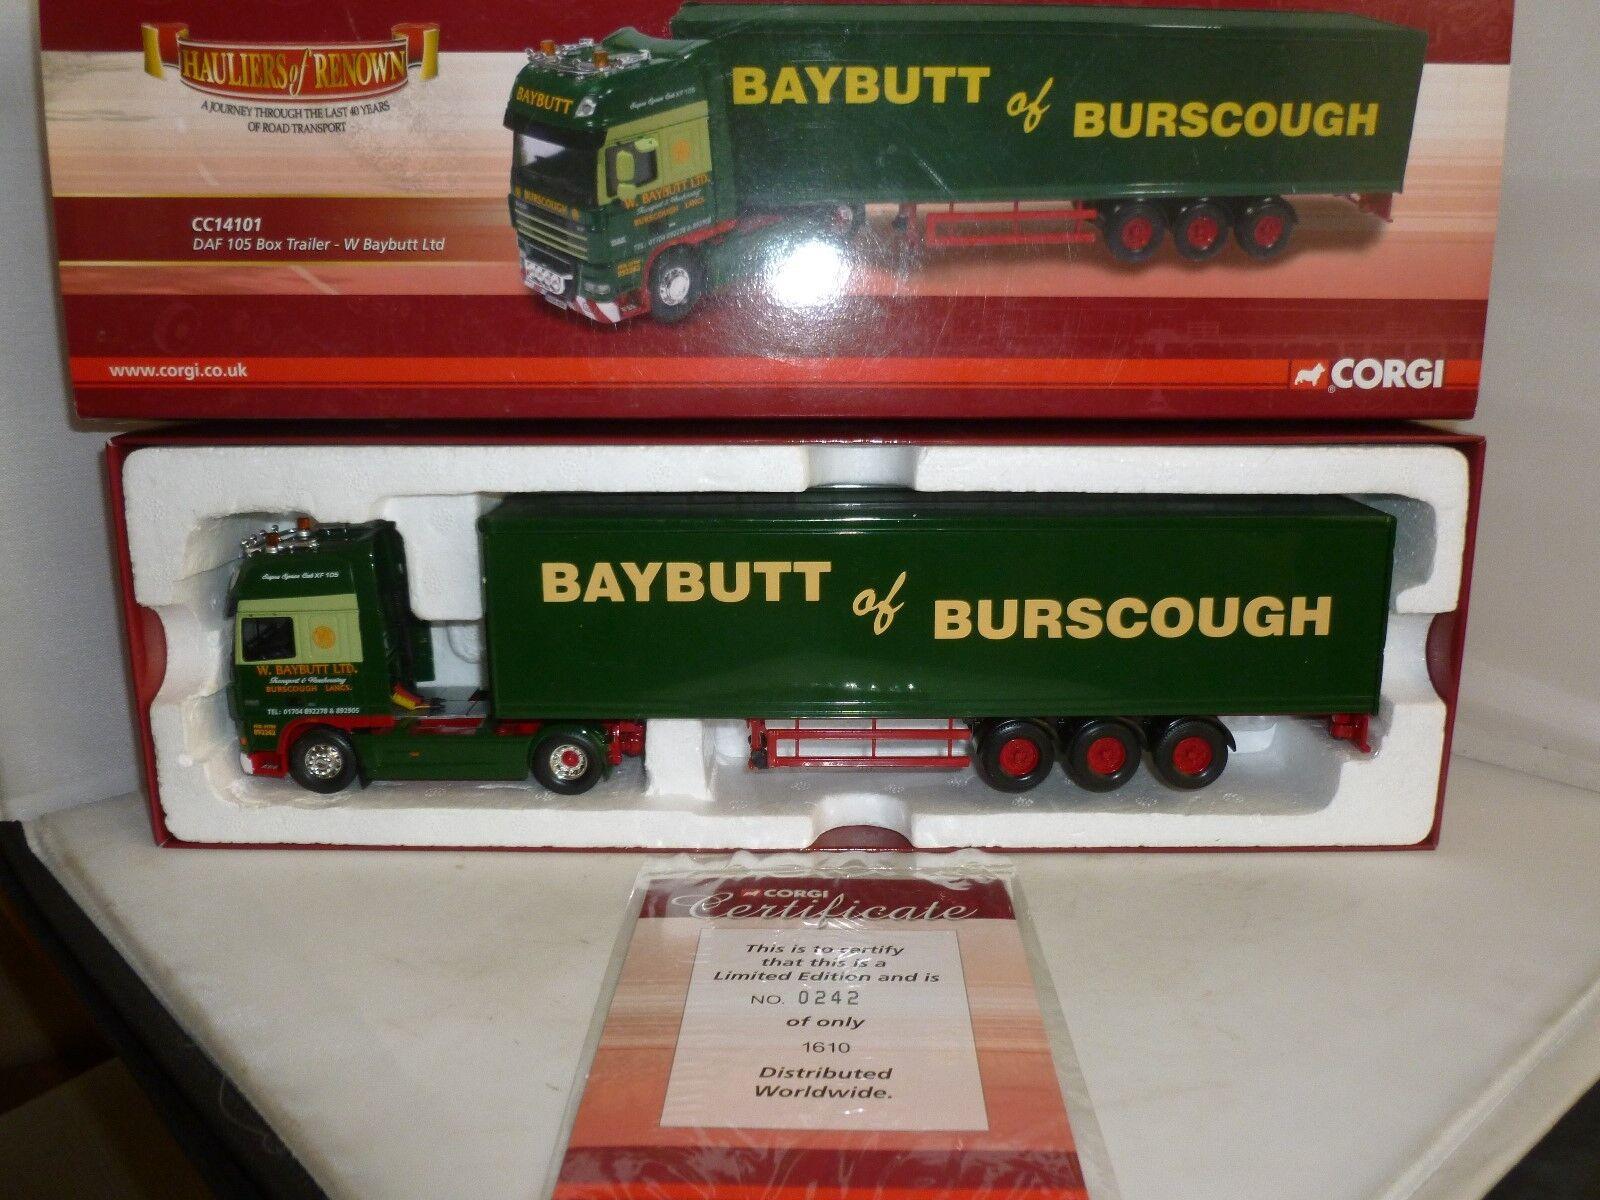 CORGI DIECAST HAULIERS OF RENOWN CC14101 DAF 105 BOX TRAILER W BAYBUTT LTD